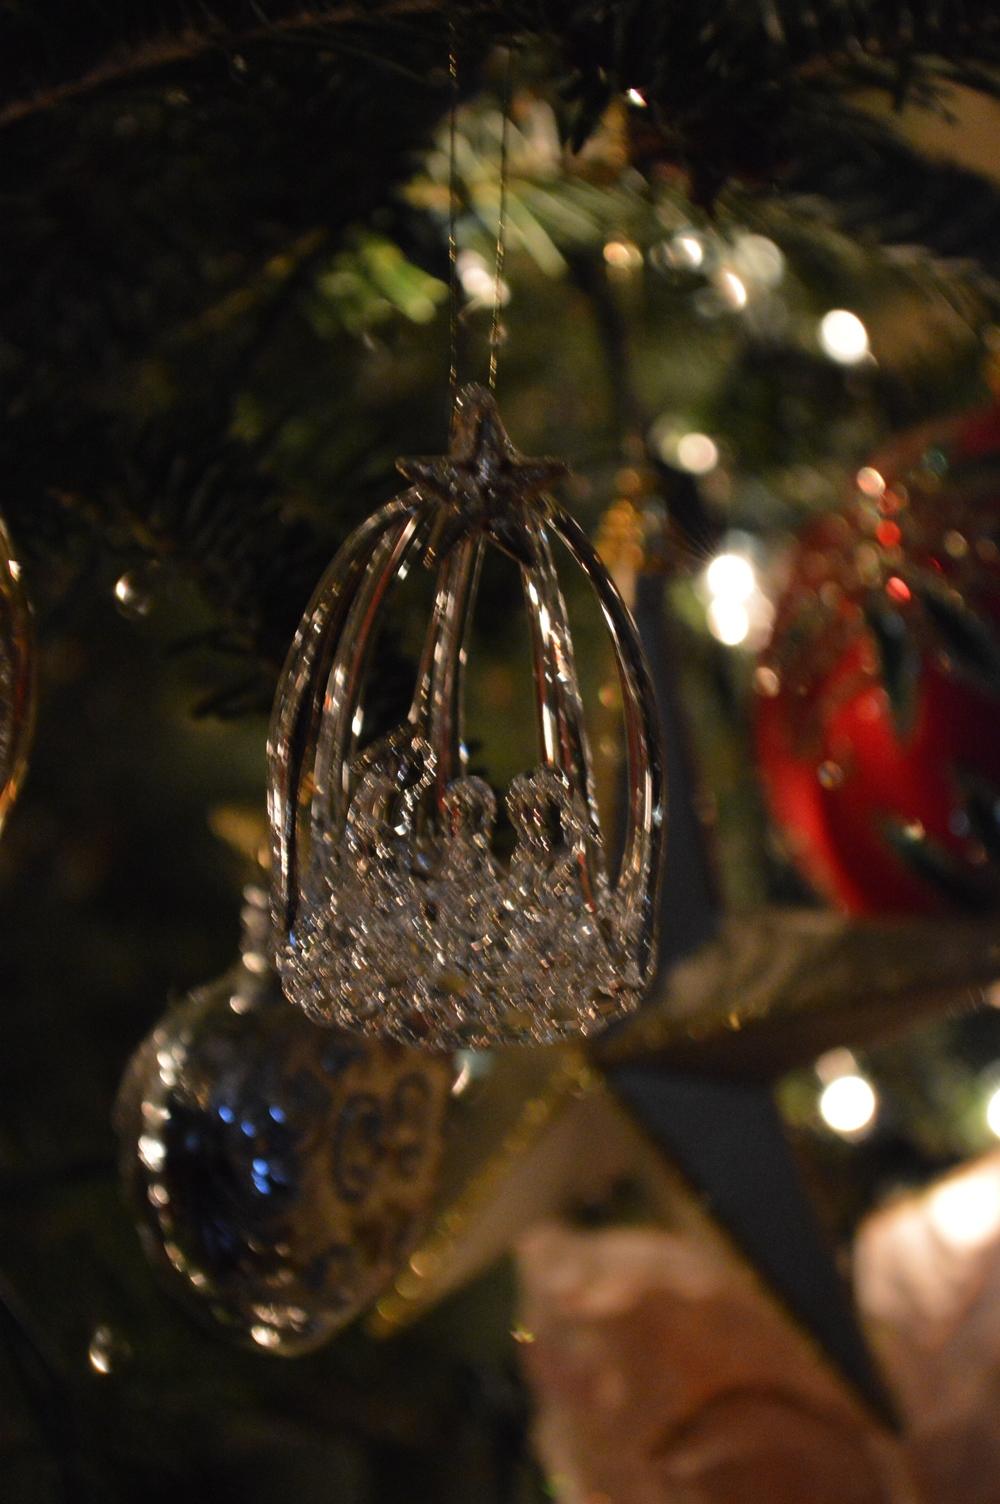 LaurenSchwaiger-Blog-Christmas-Ornaments-Tradtion.jpg